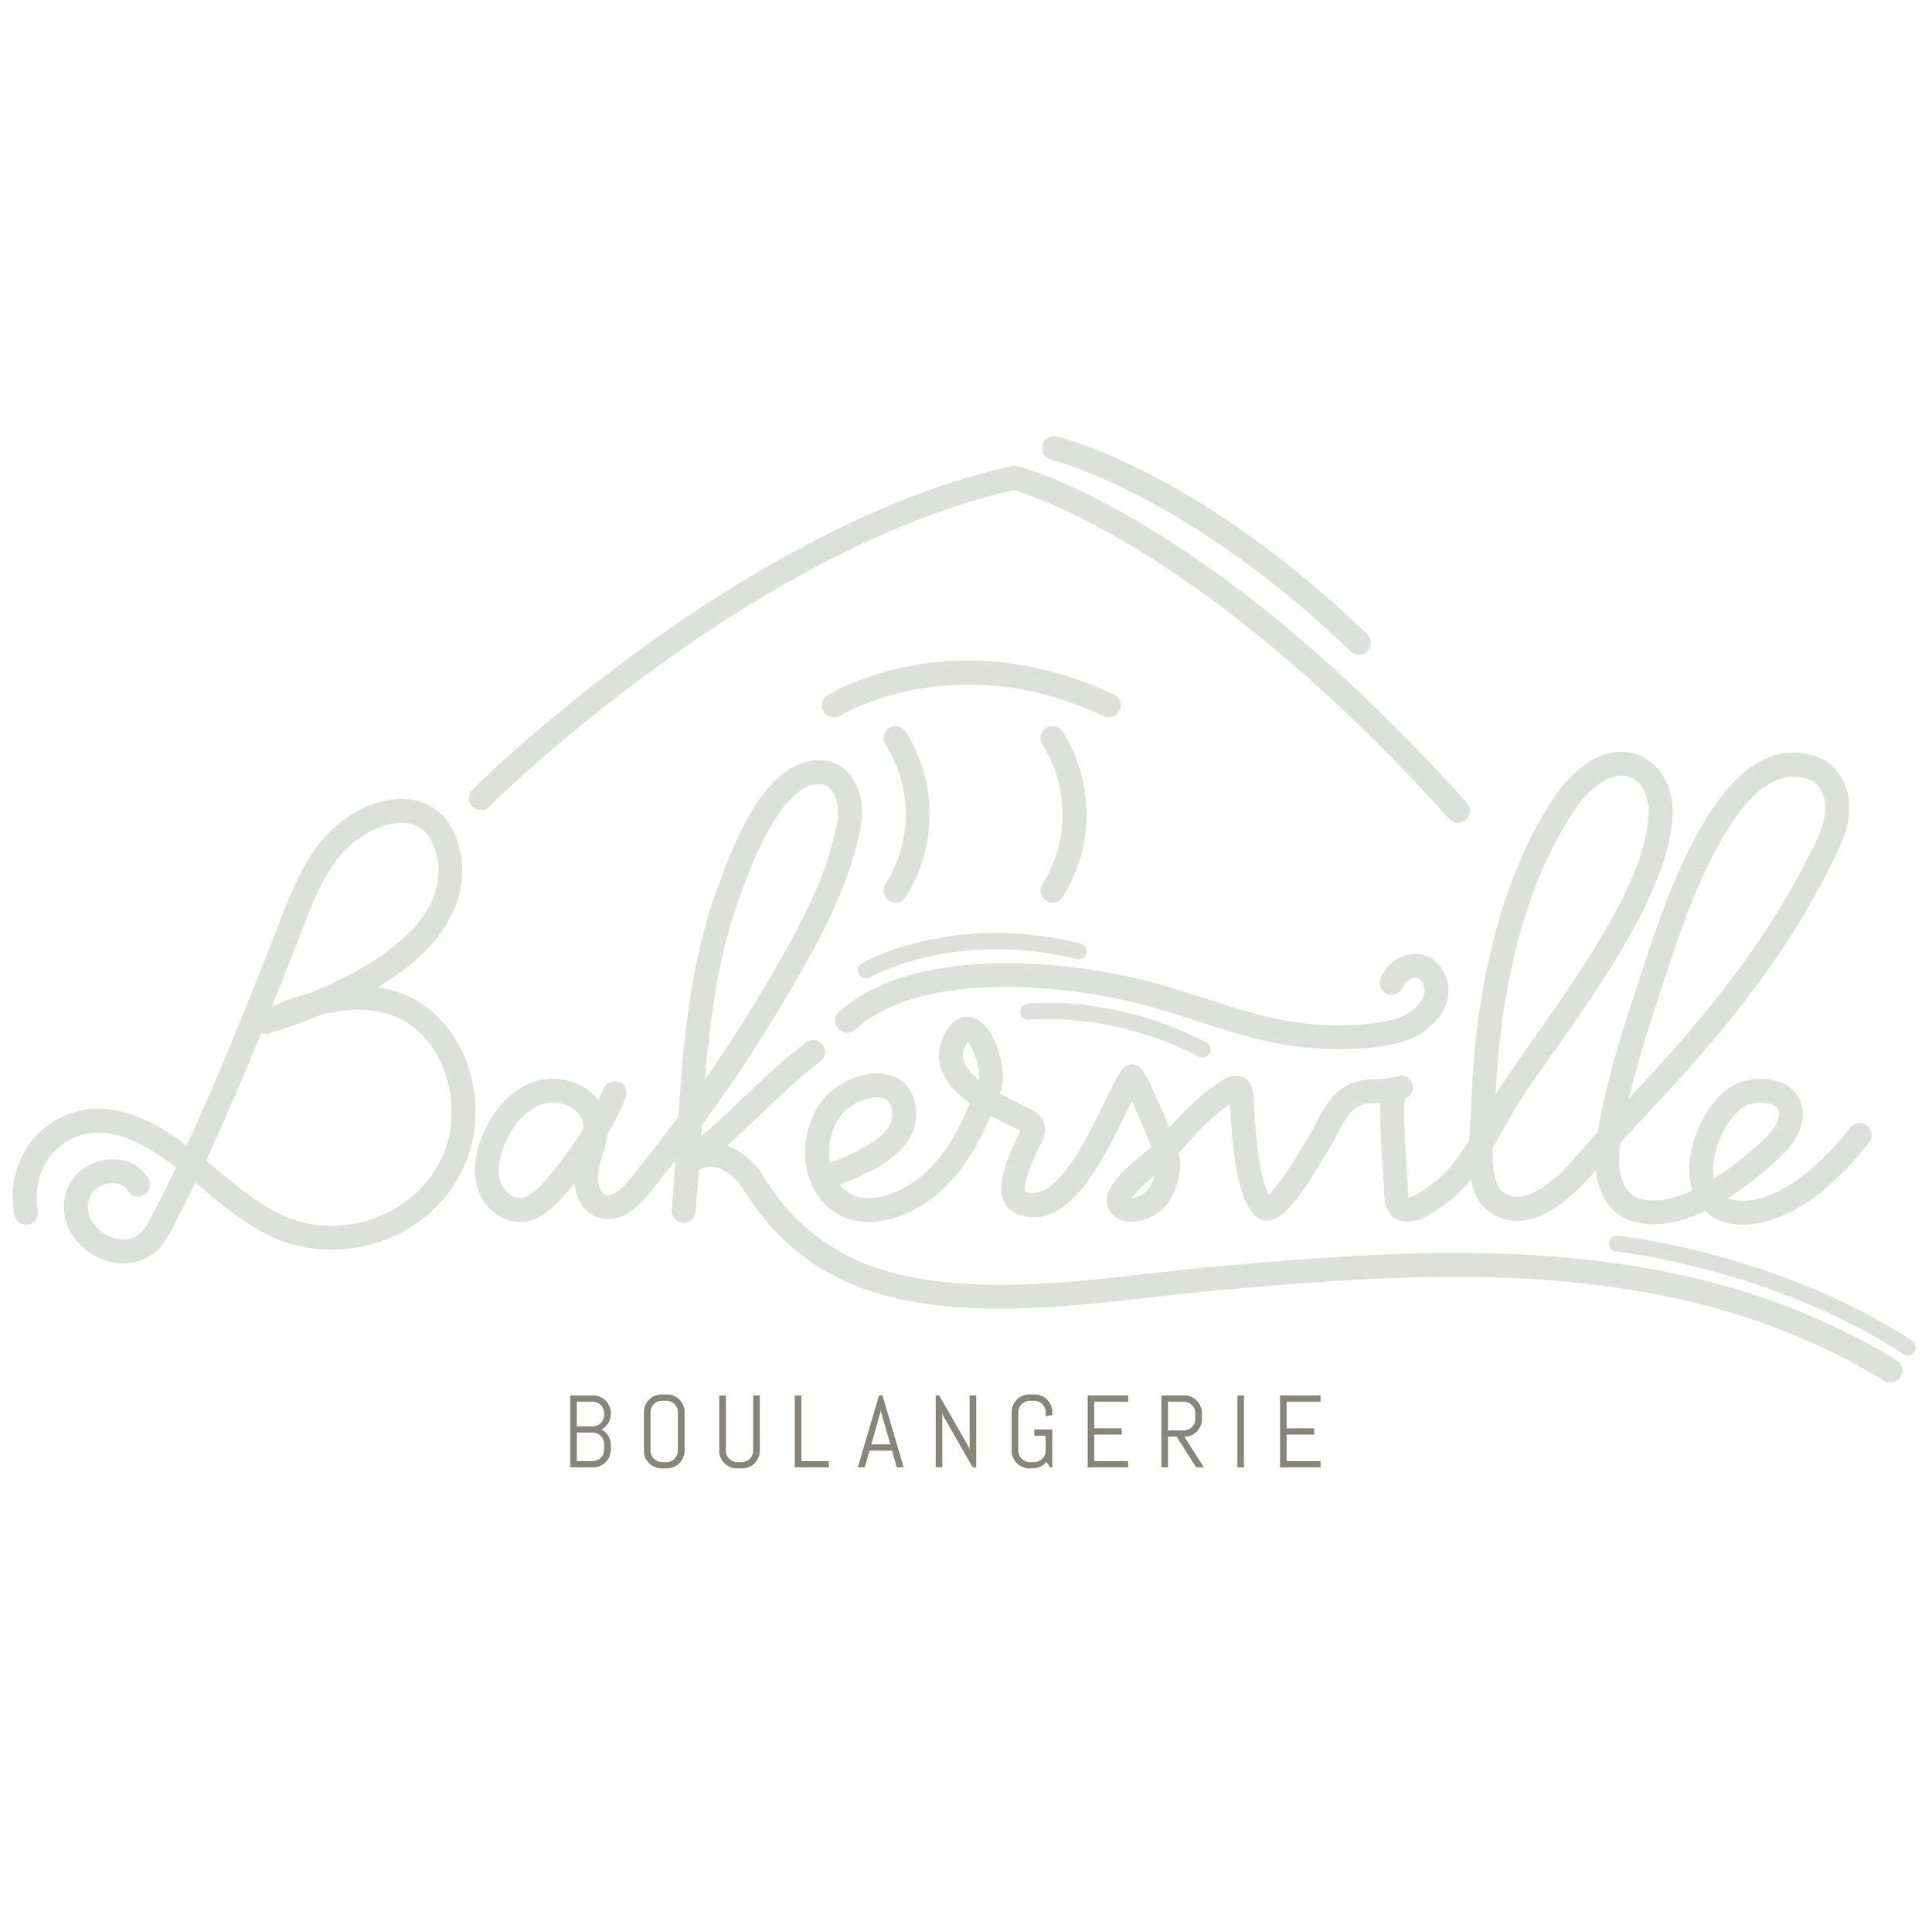 FINAL_BAKERSVILLE-LOGO_BAKERSVILLE-INV.CMYK.jpg